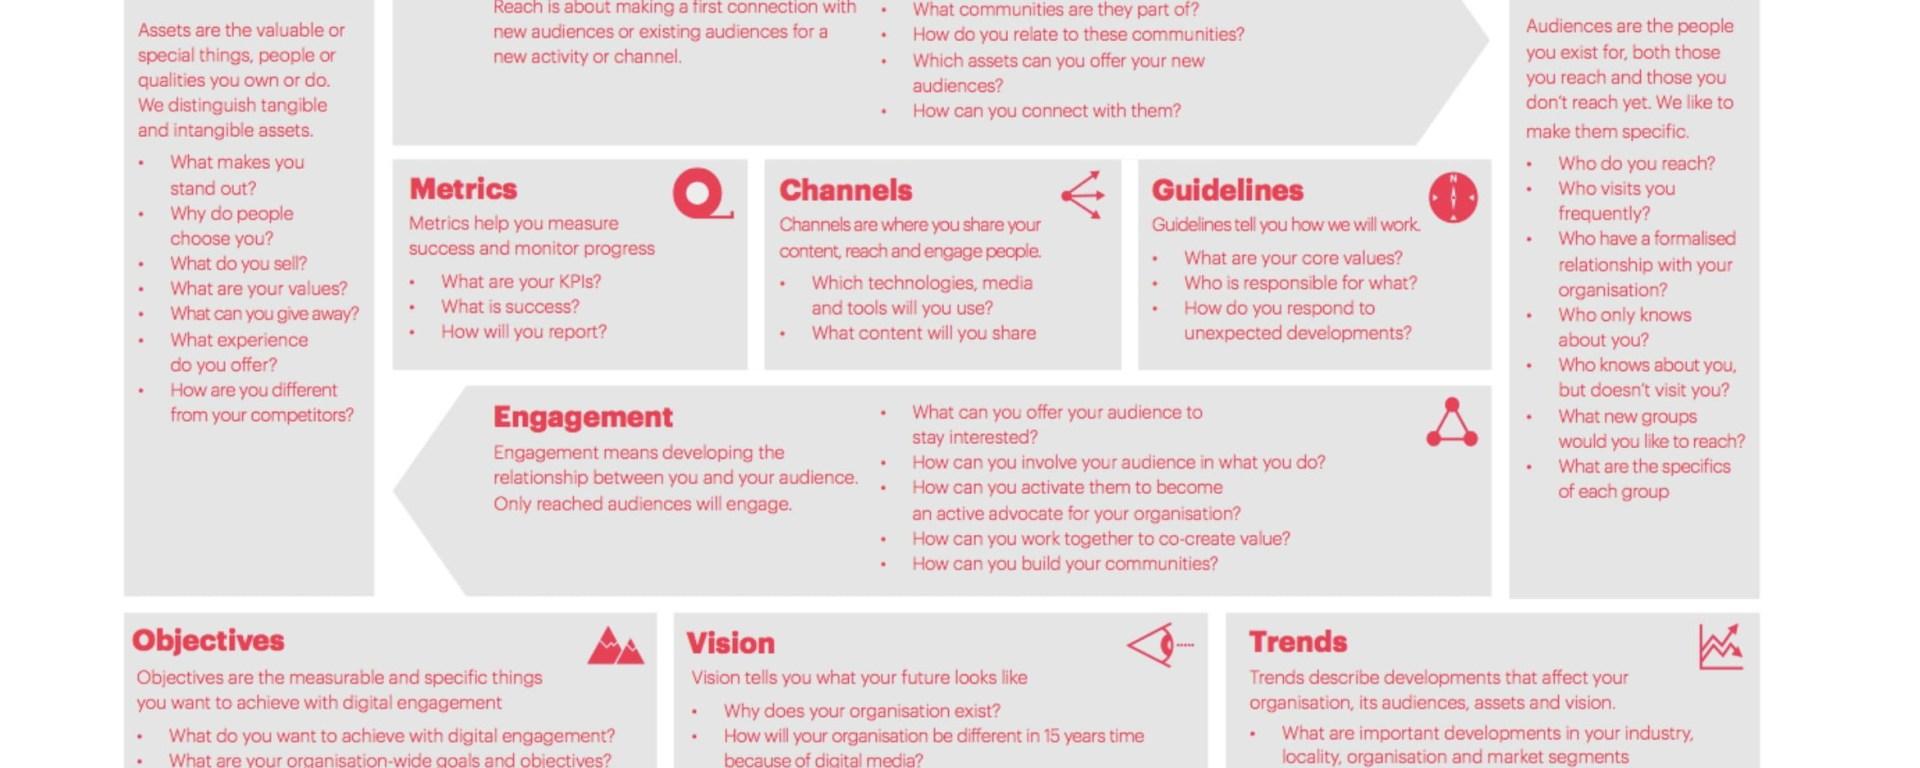 Digital engagement framework for accessible communications strategies